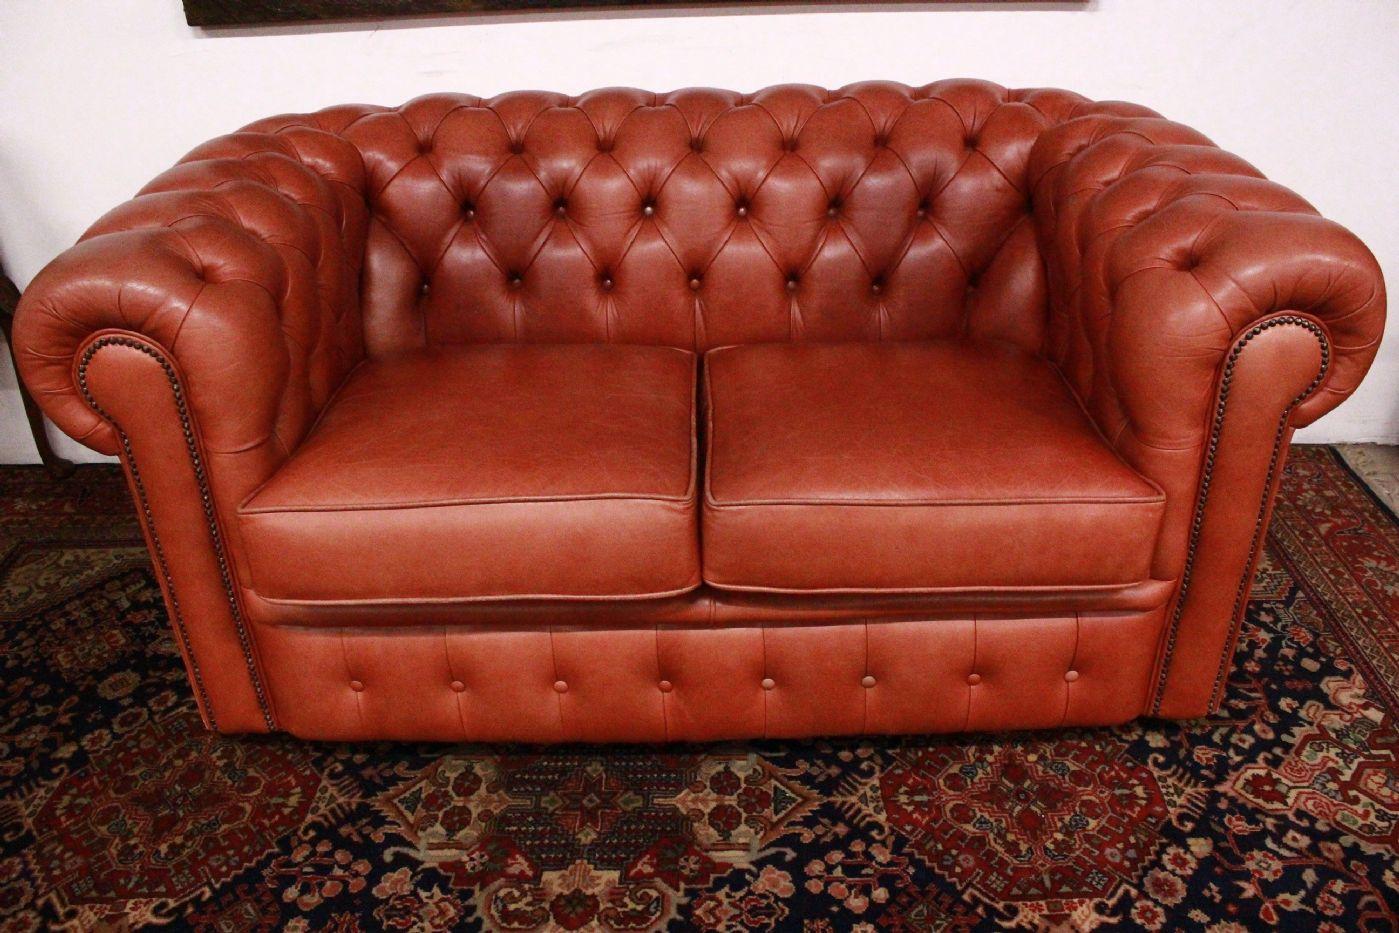 Divano In Pelle Chester.Chesterfield Sofa Chester English 2 Places Apricot Skin Color